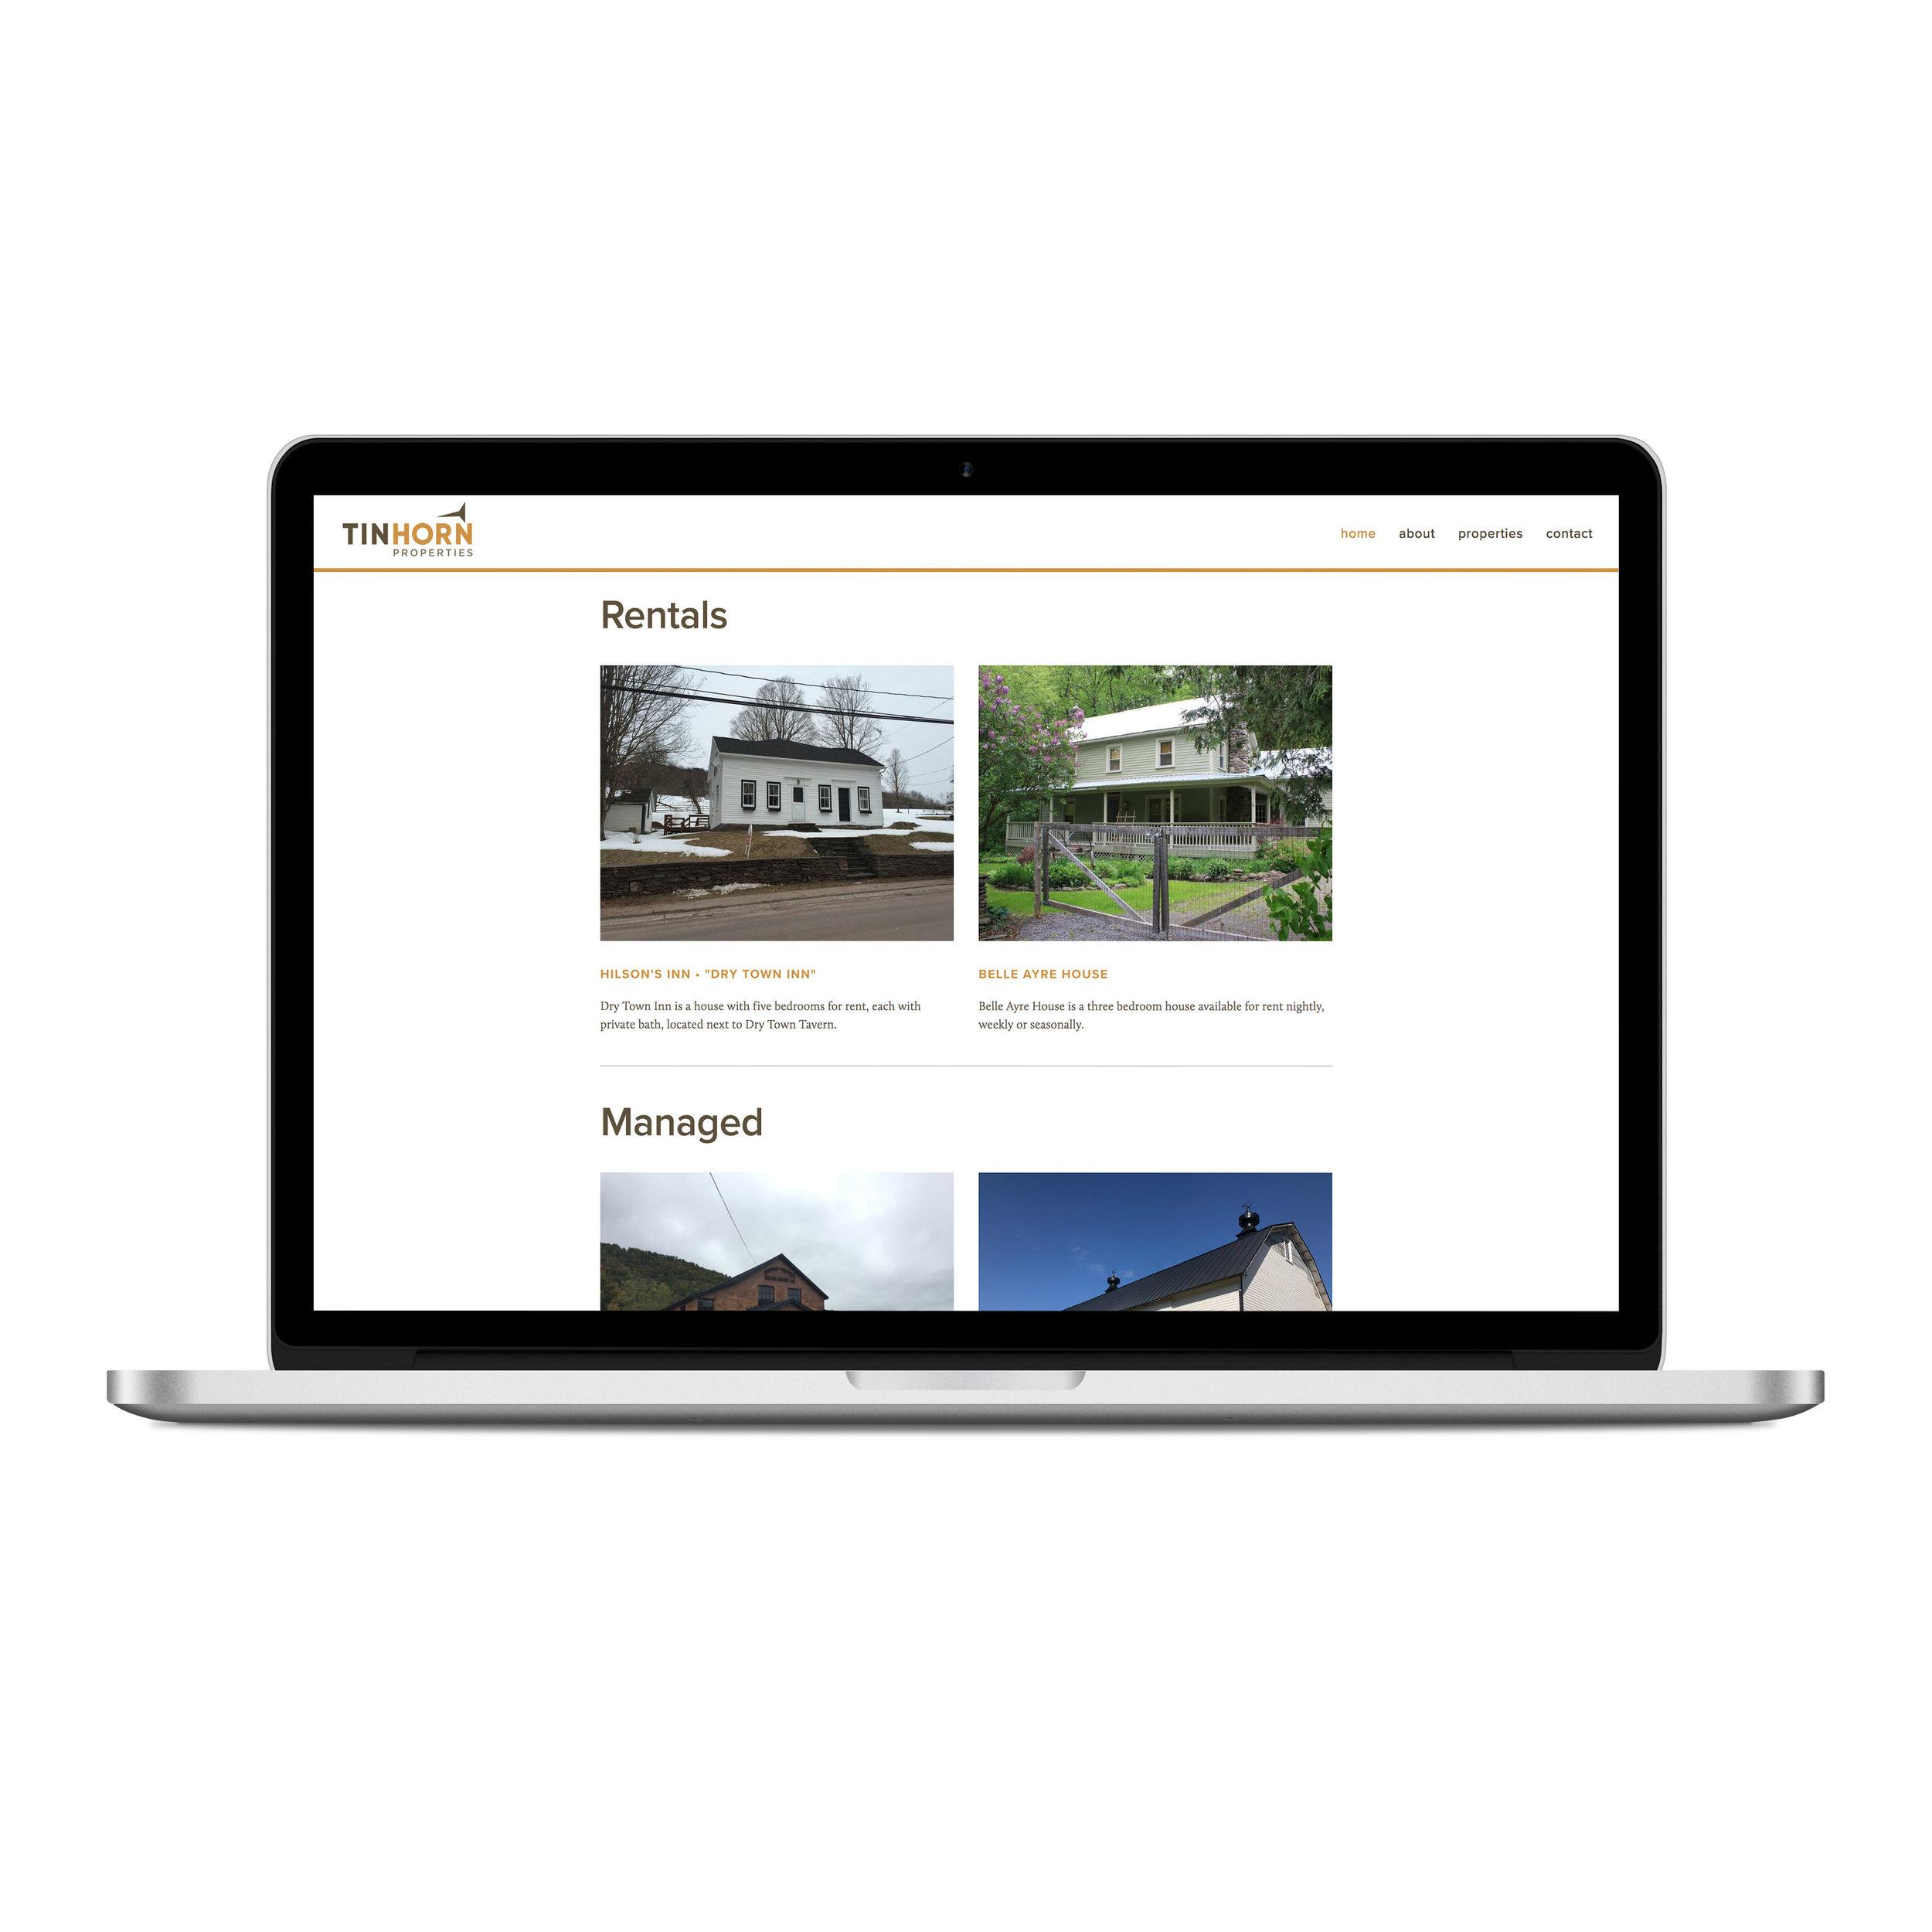 Tinhorn_MacBook-Pro_Mockup_2.jpg